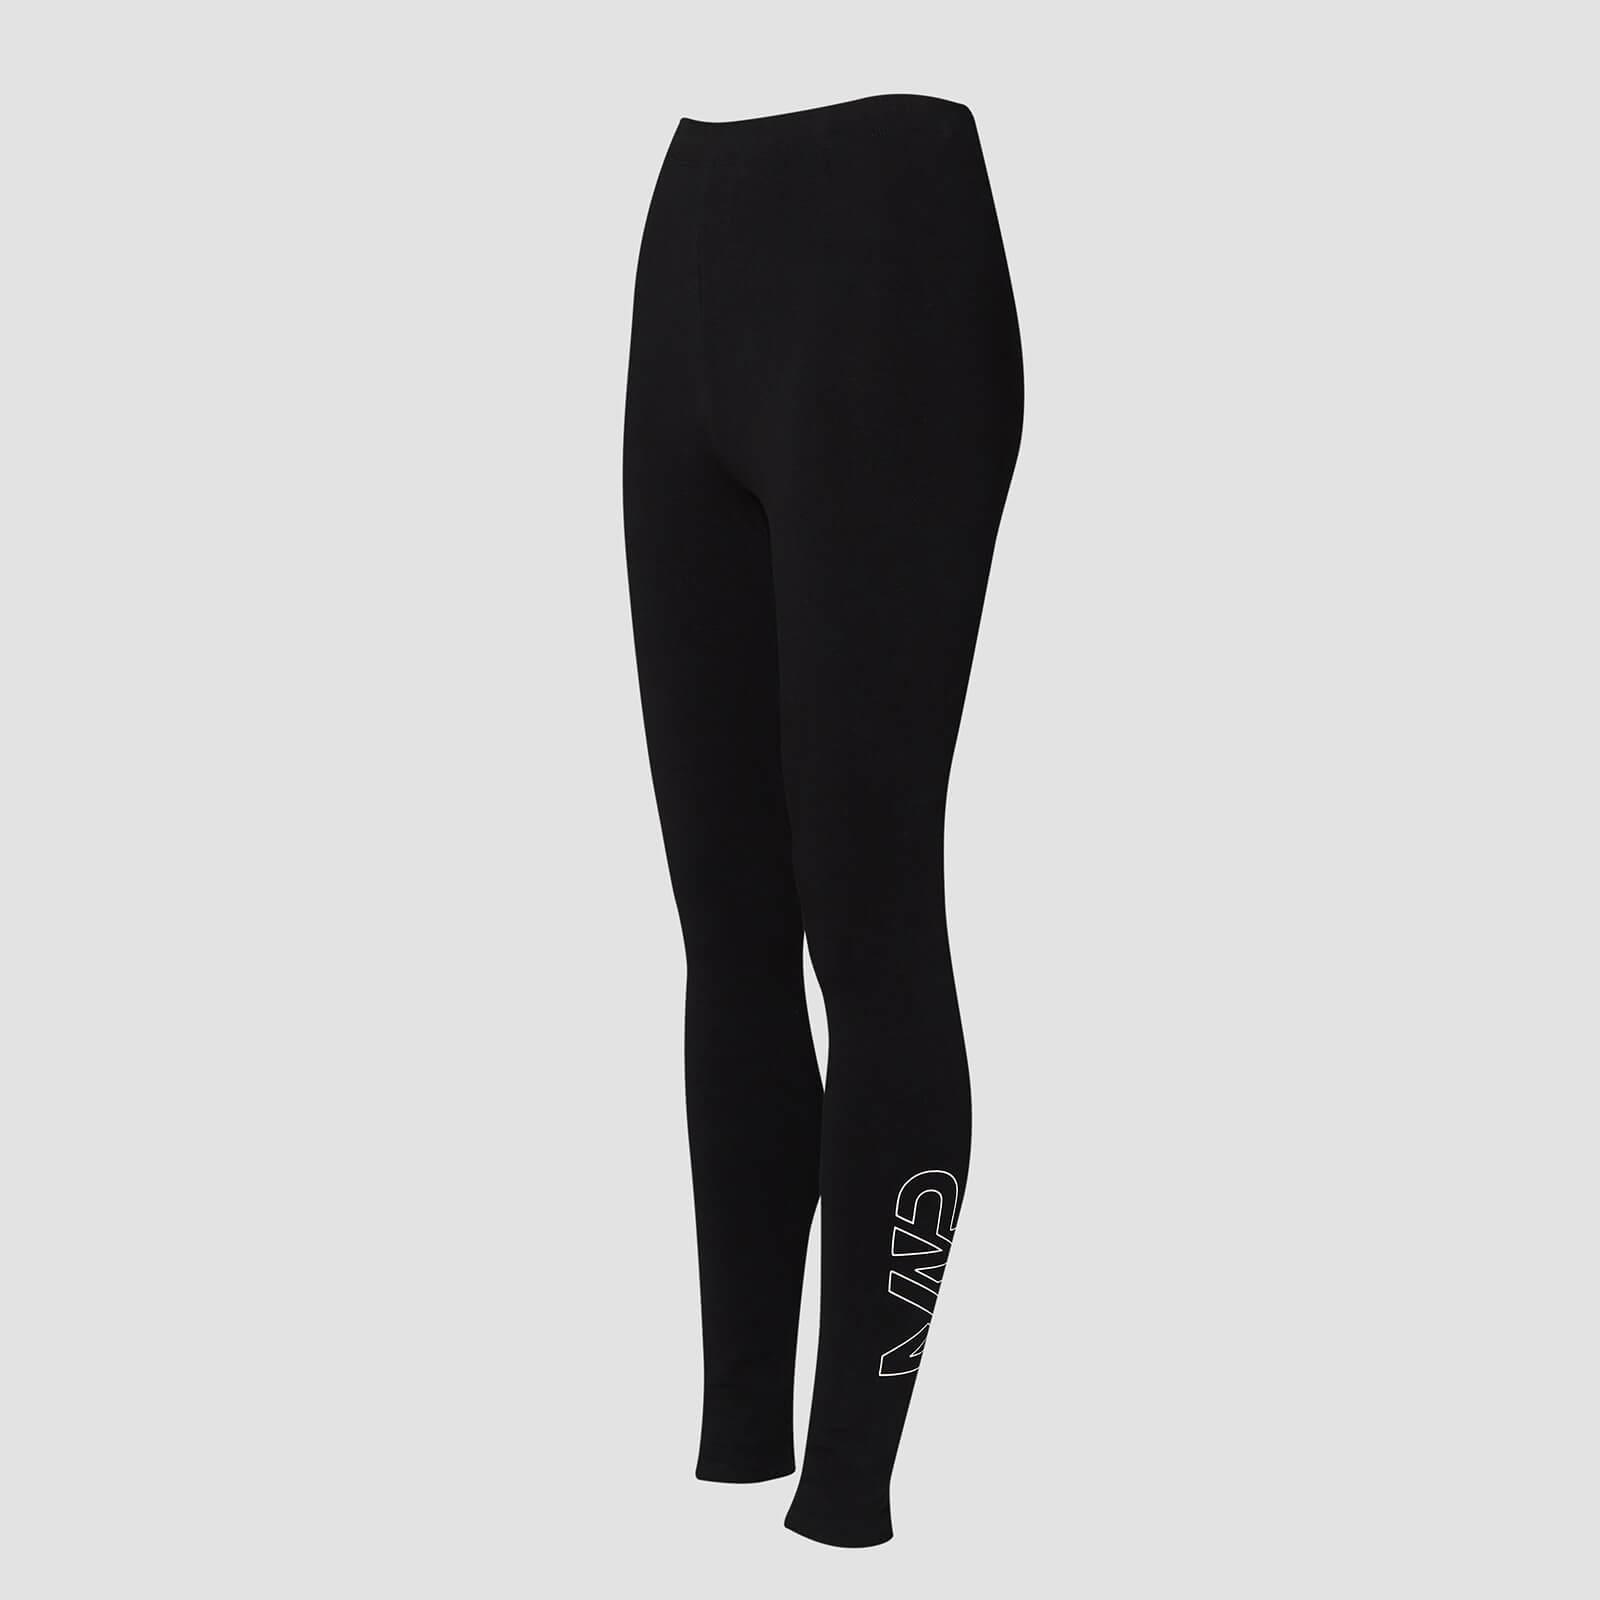 Legging MP Jersey - Noir - XXS